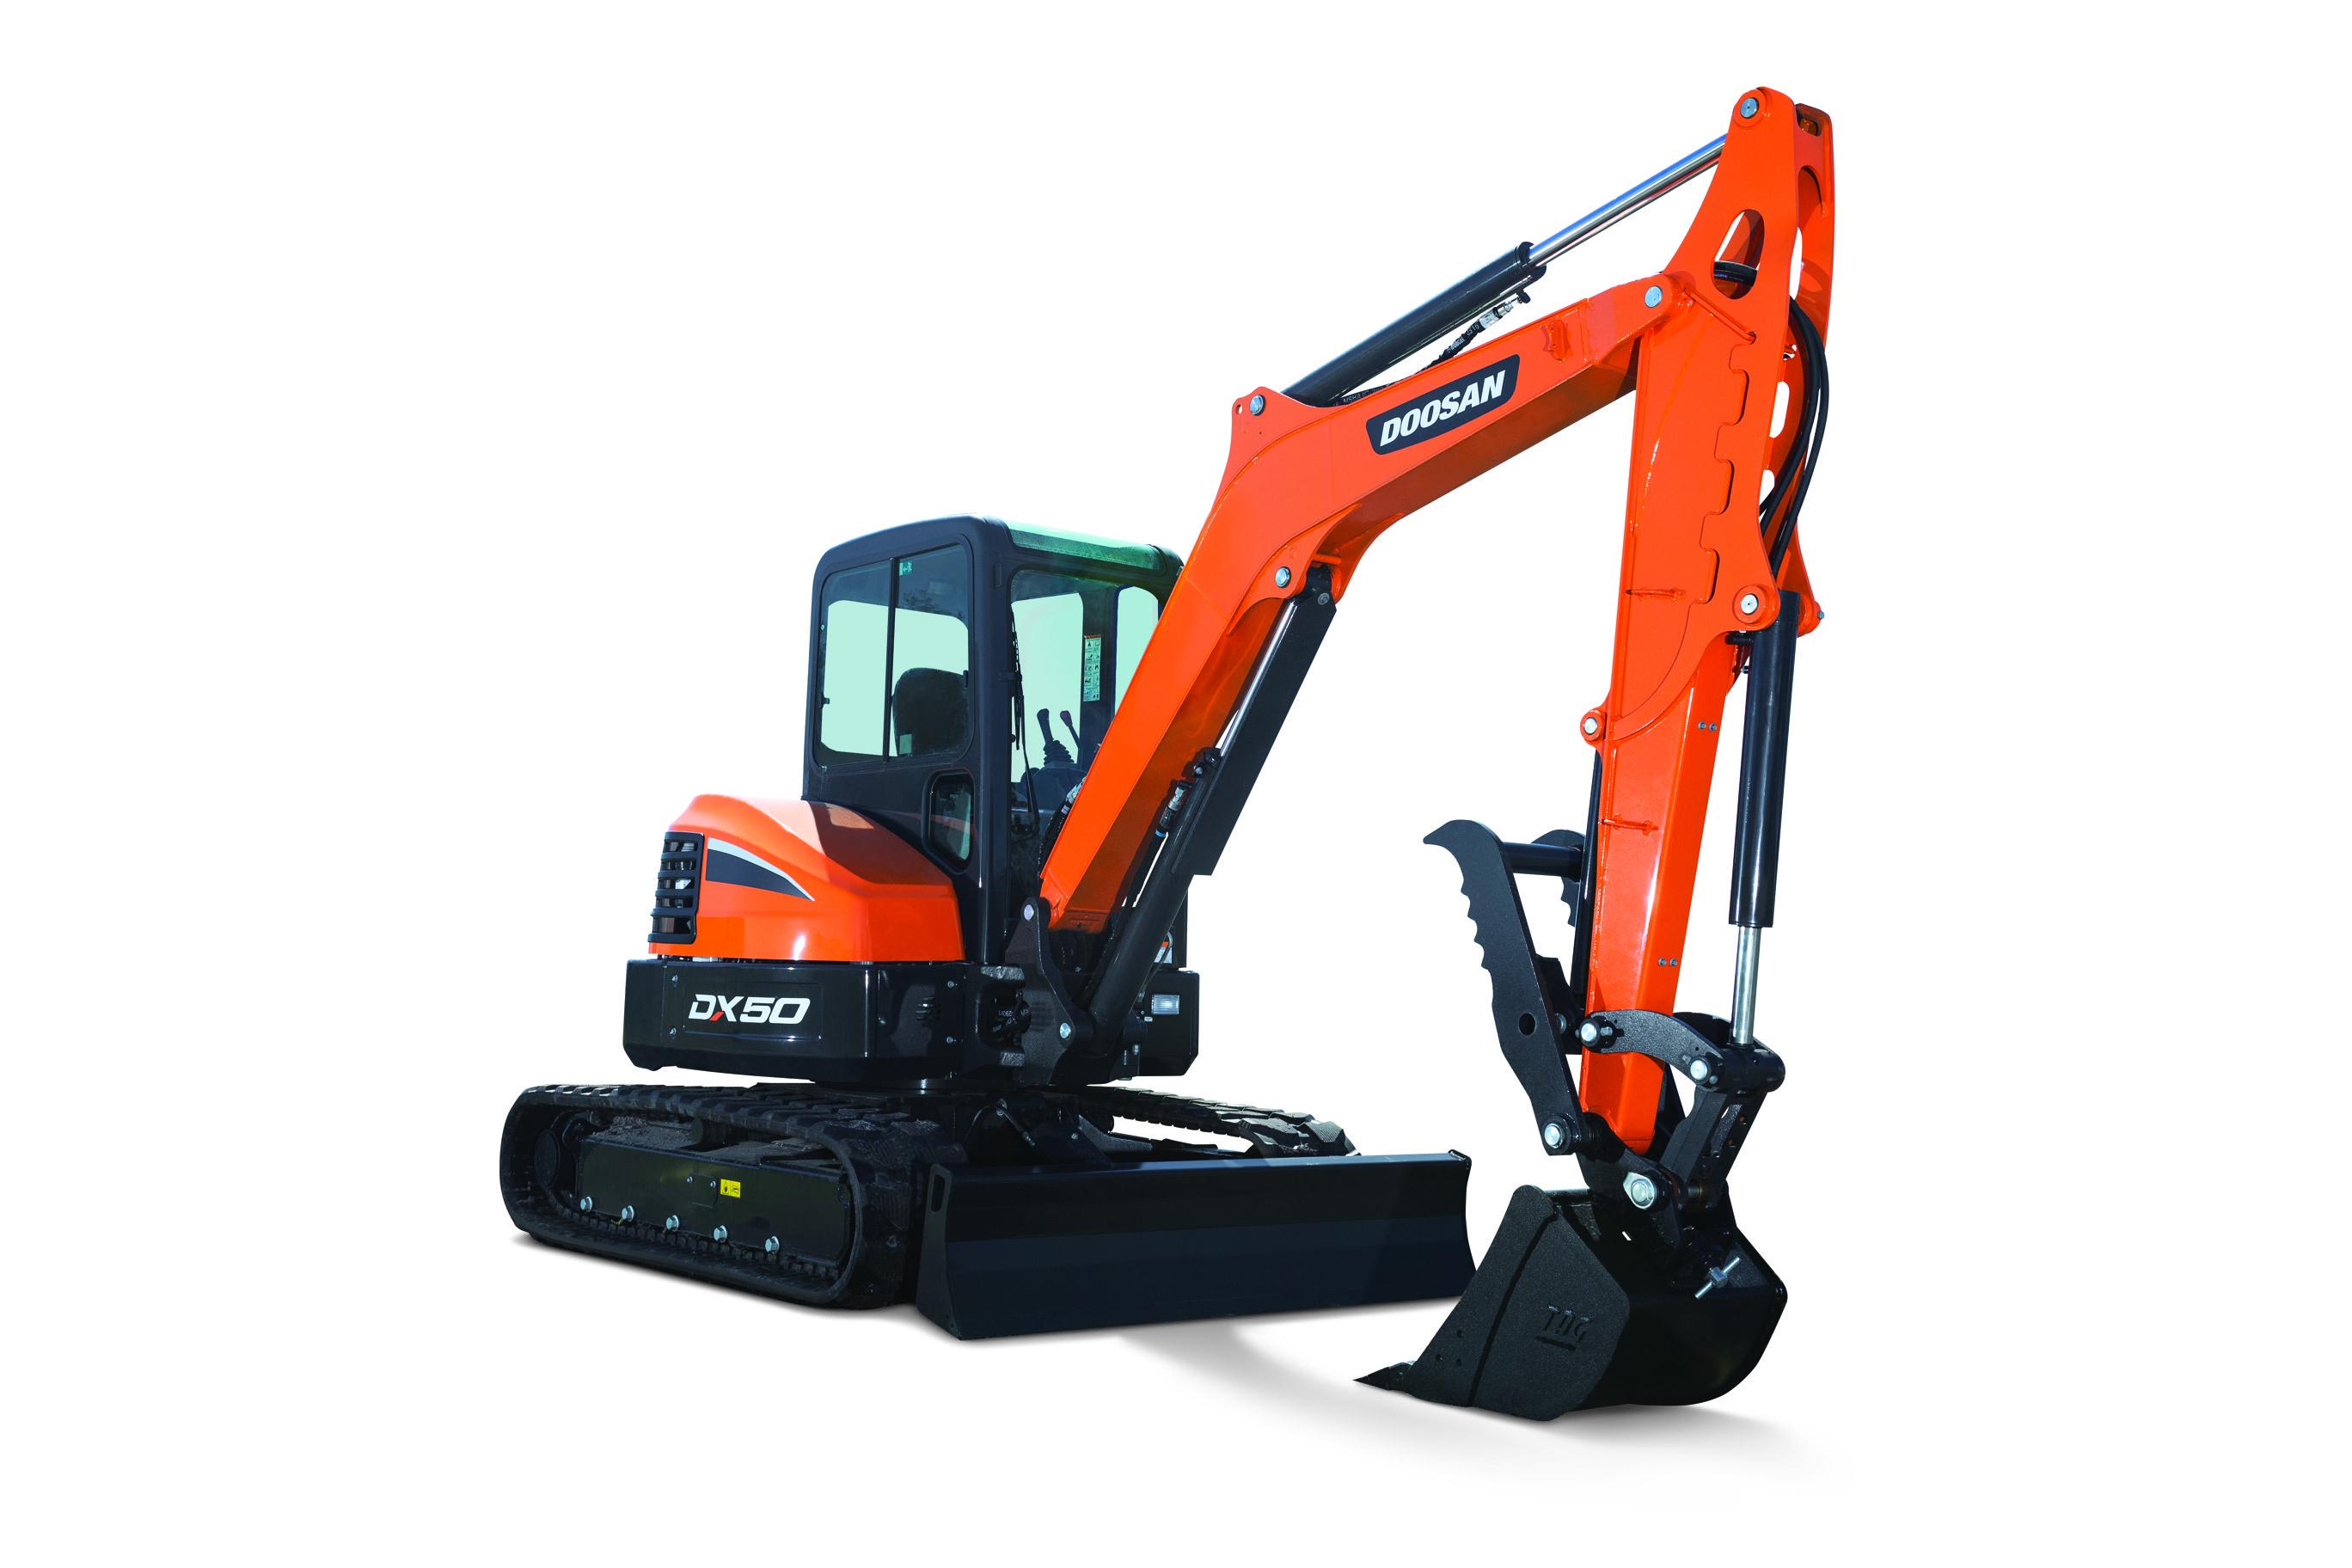 New Mini Excavators From Doosan Equipment World Magazine